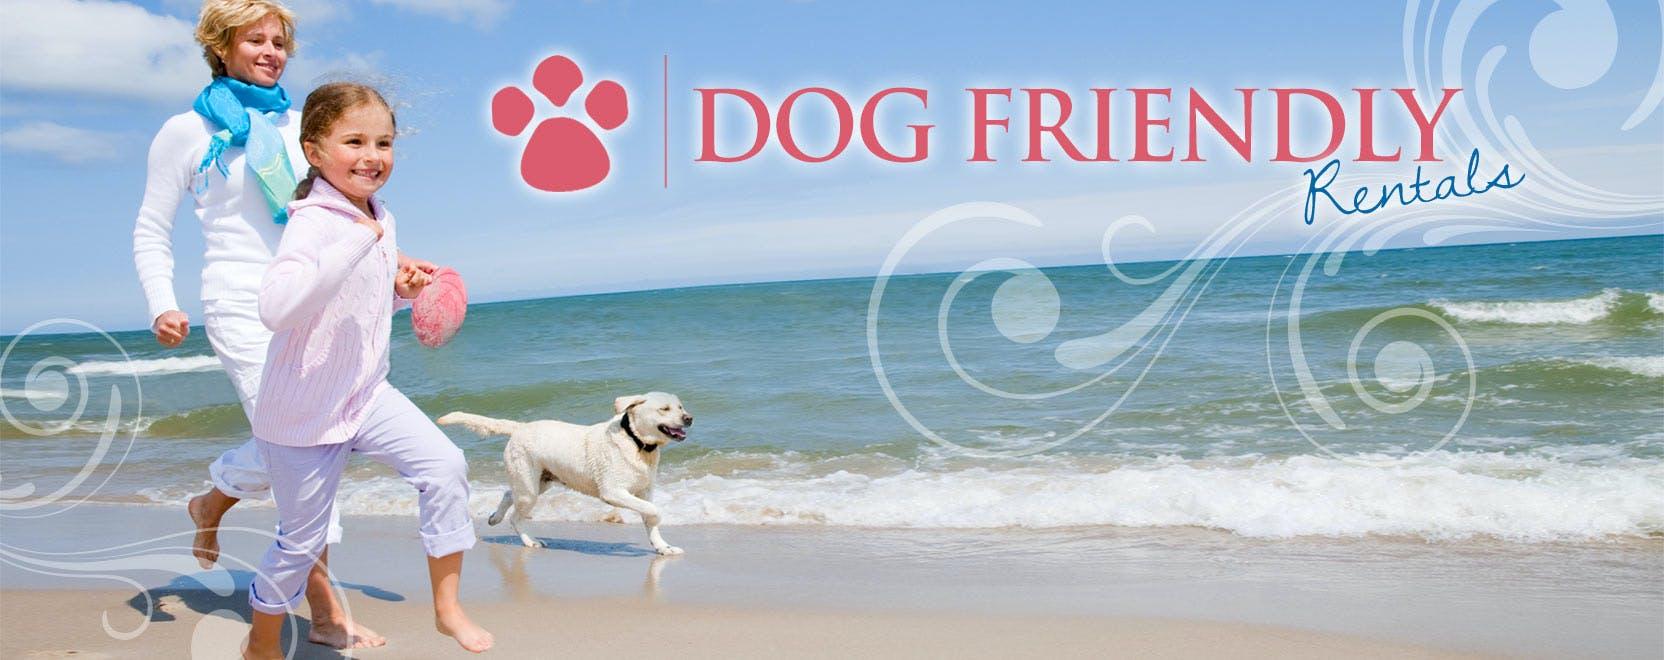 Pet Friendly Vacation Rentals in Myrtle Beach